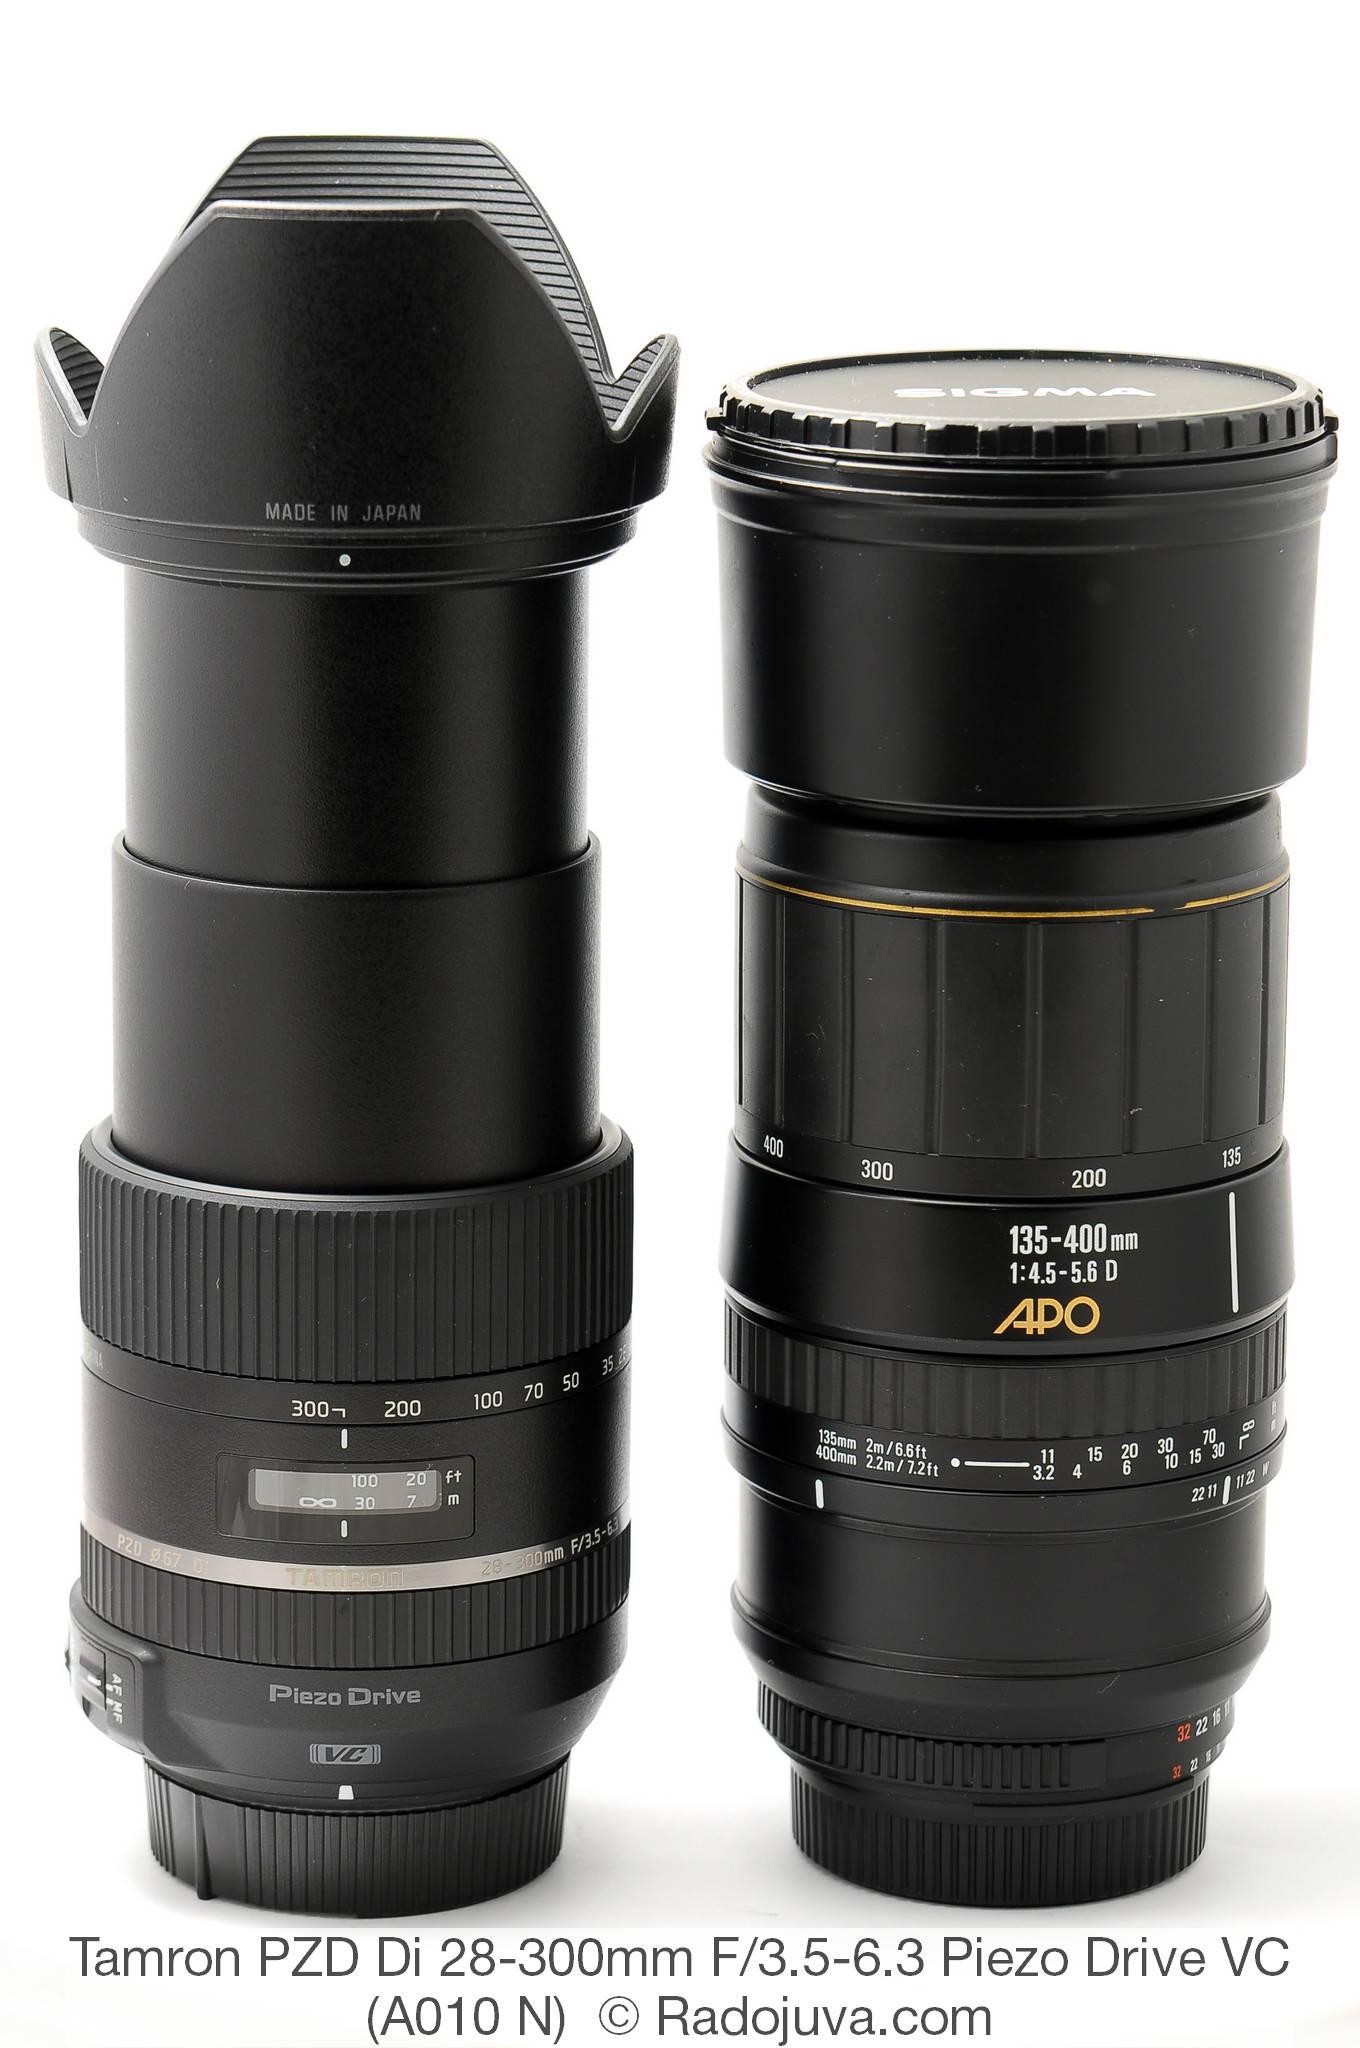 Размеры Tamron PZD Di 28-300mm F/3.5-6.3 Piezo Drive VC Model A010 и Sigma 135-400mm 1:4.5-5.6 D APO